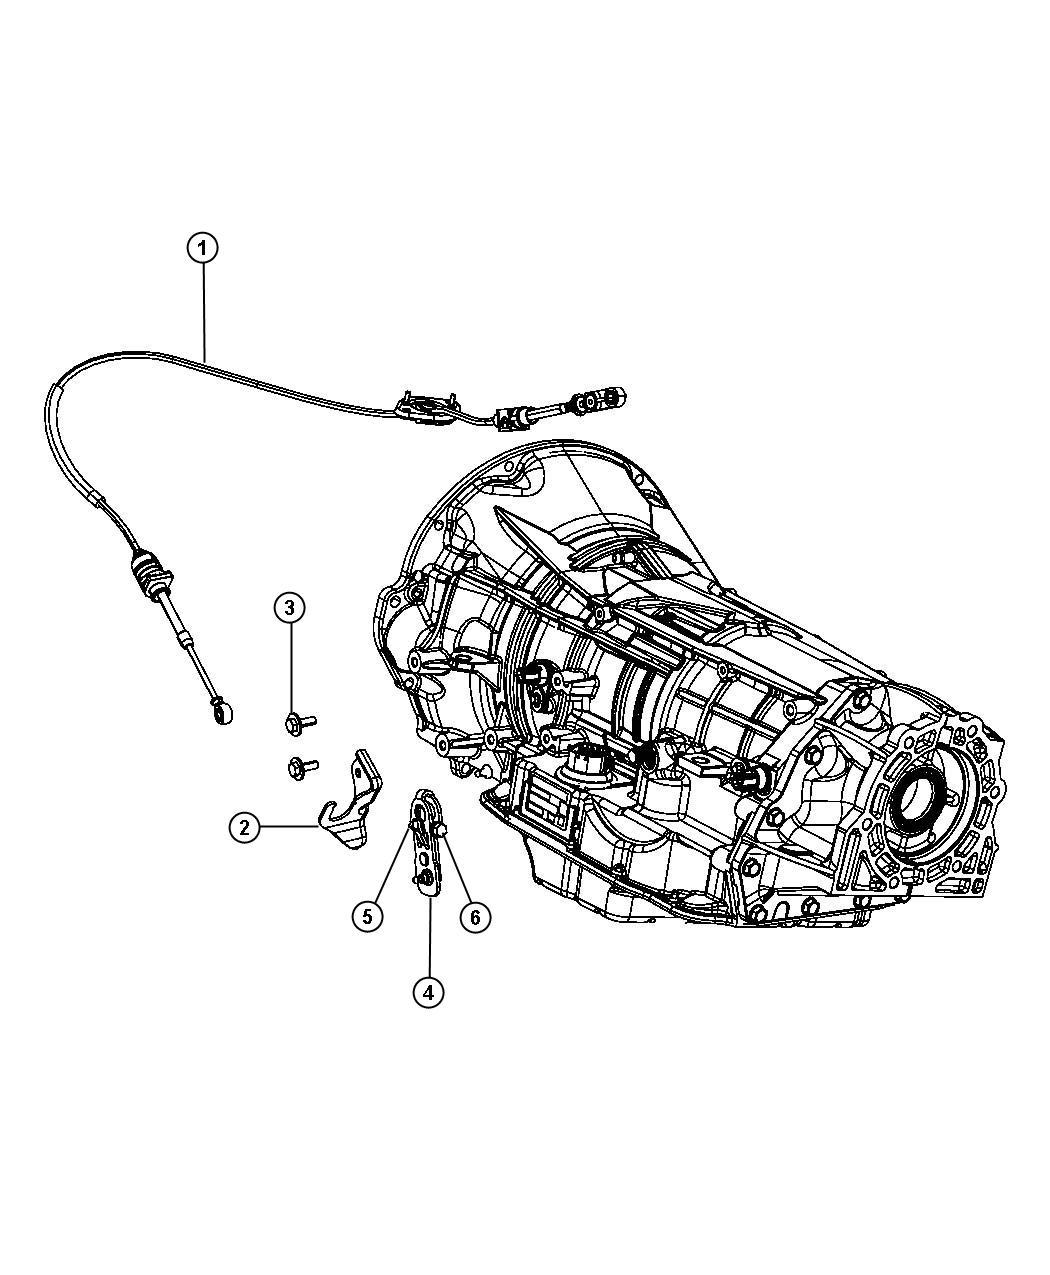 Jeep Wrangler Cable Shift Transmission Auto